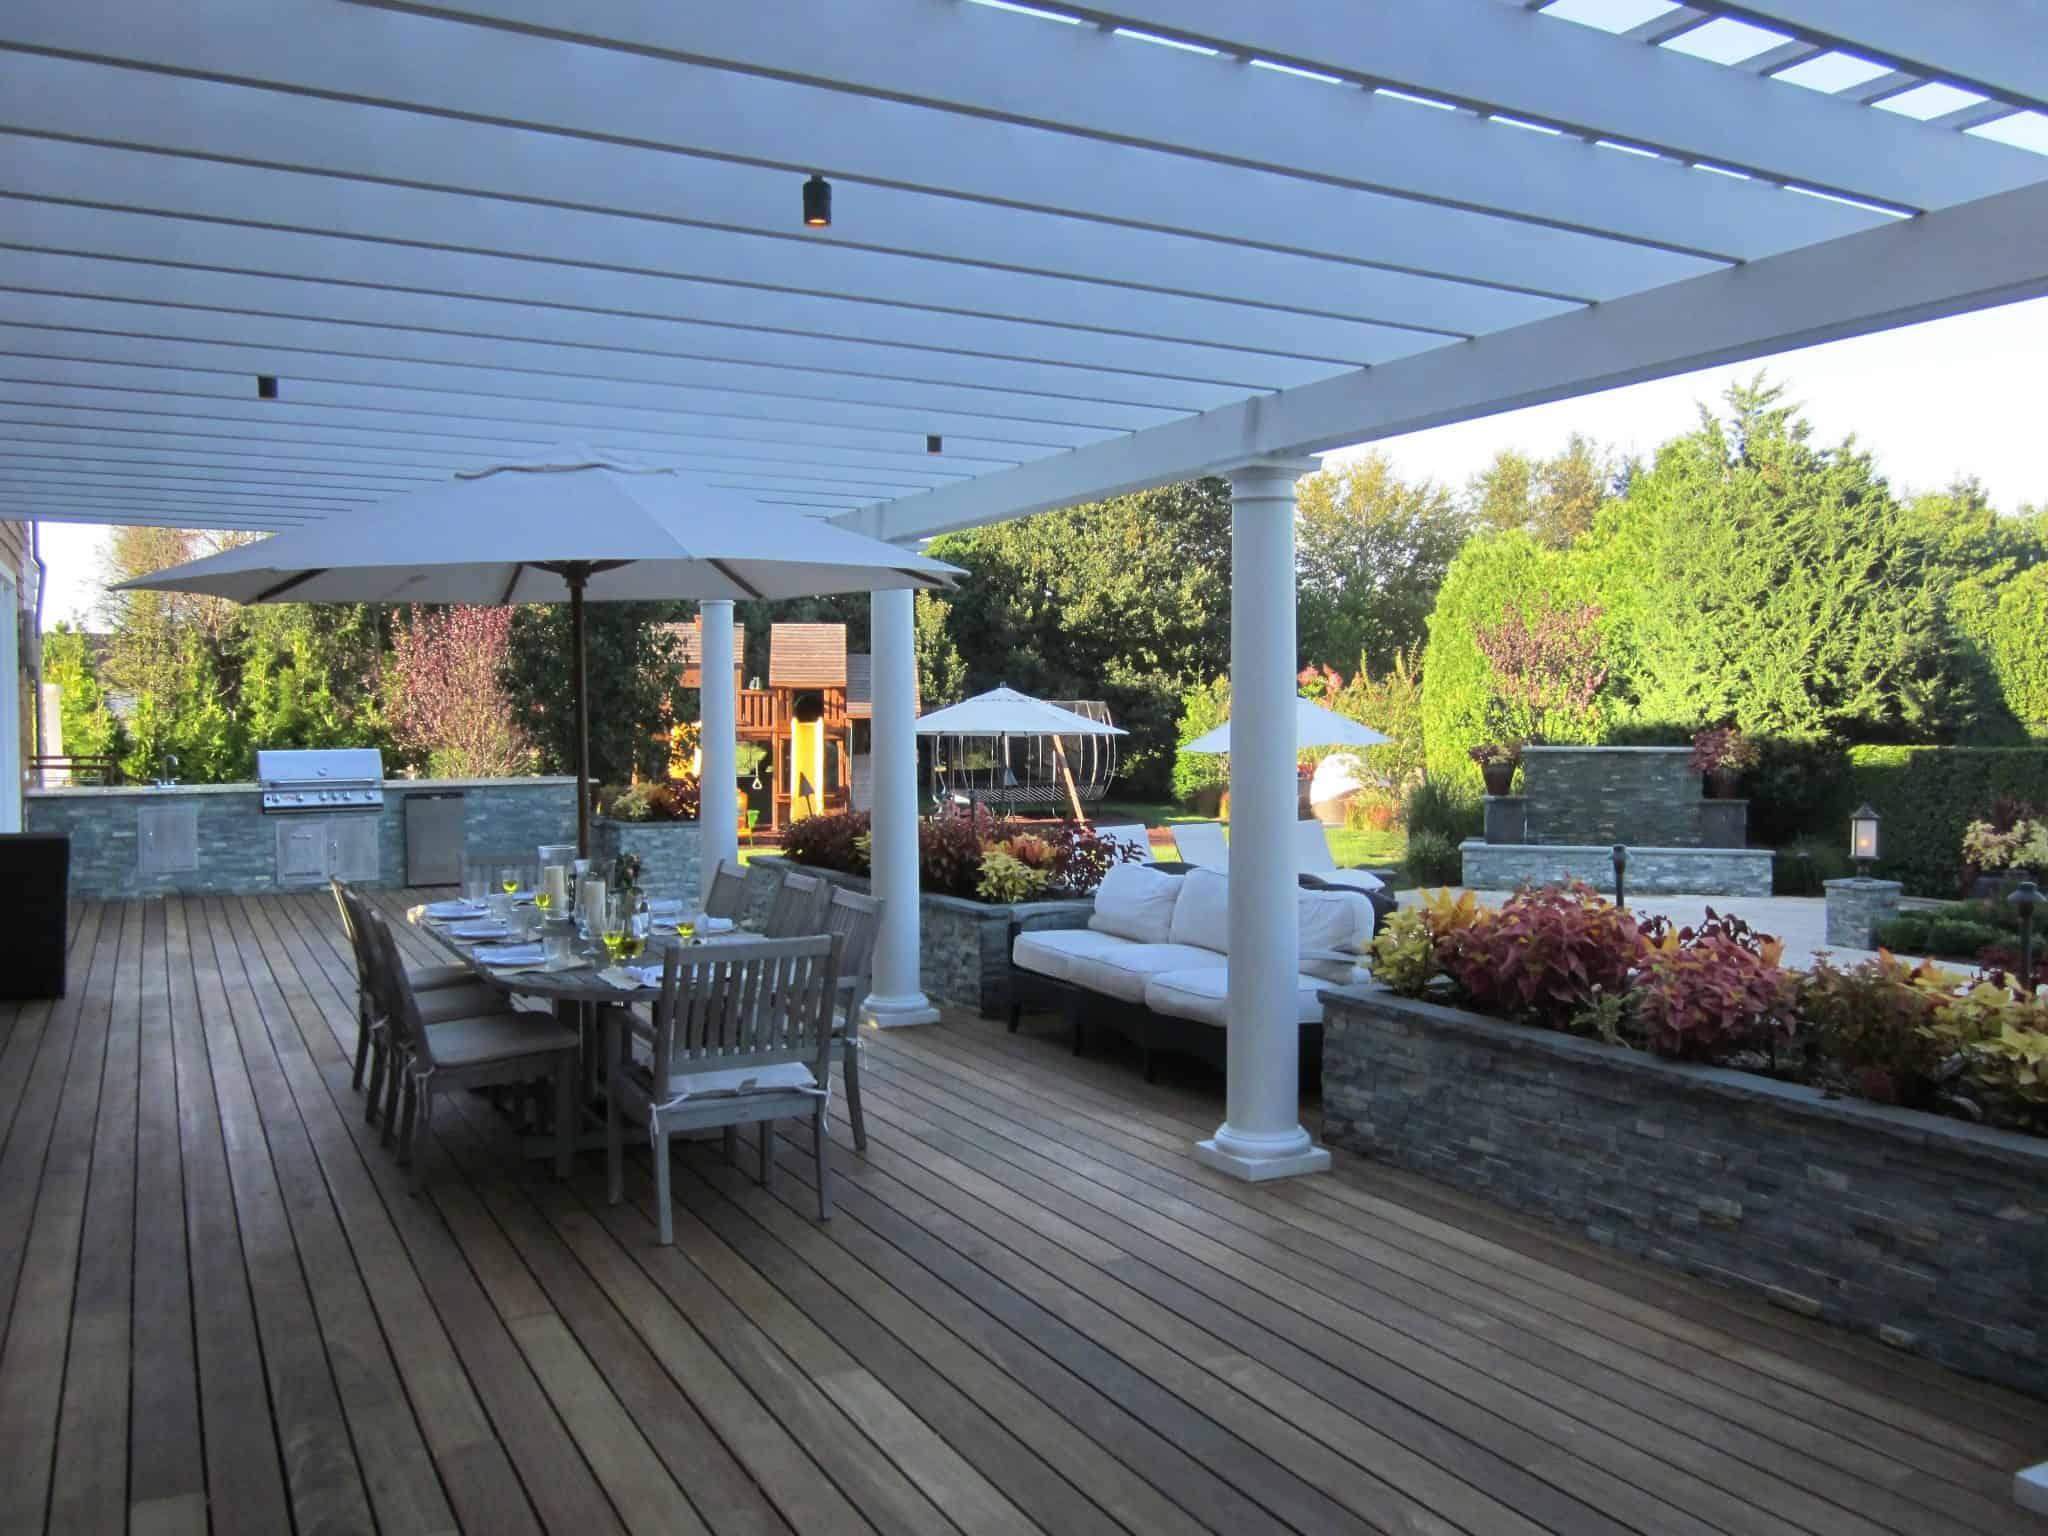 14' x 50' IPE deck with Trex risers - Southampton, Long Island NY